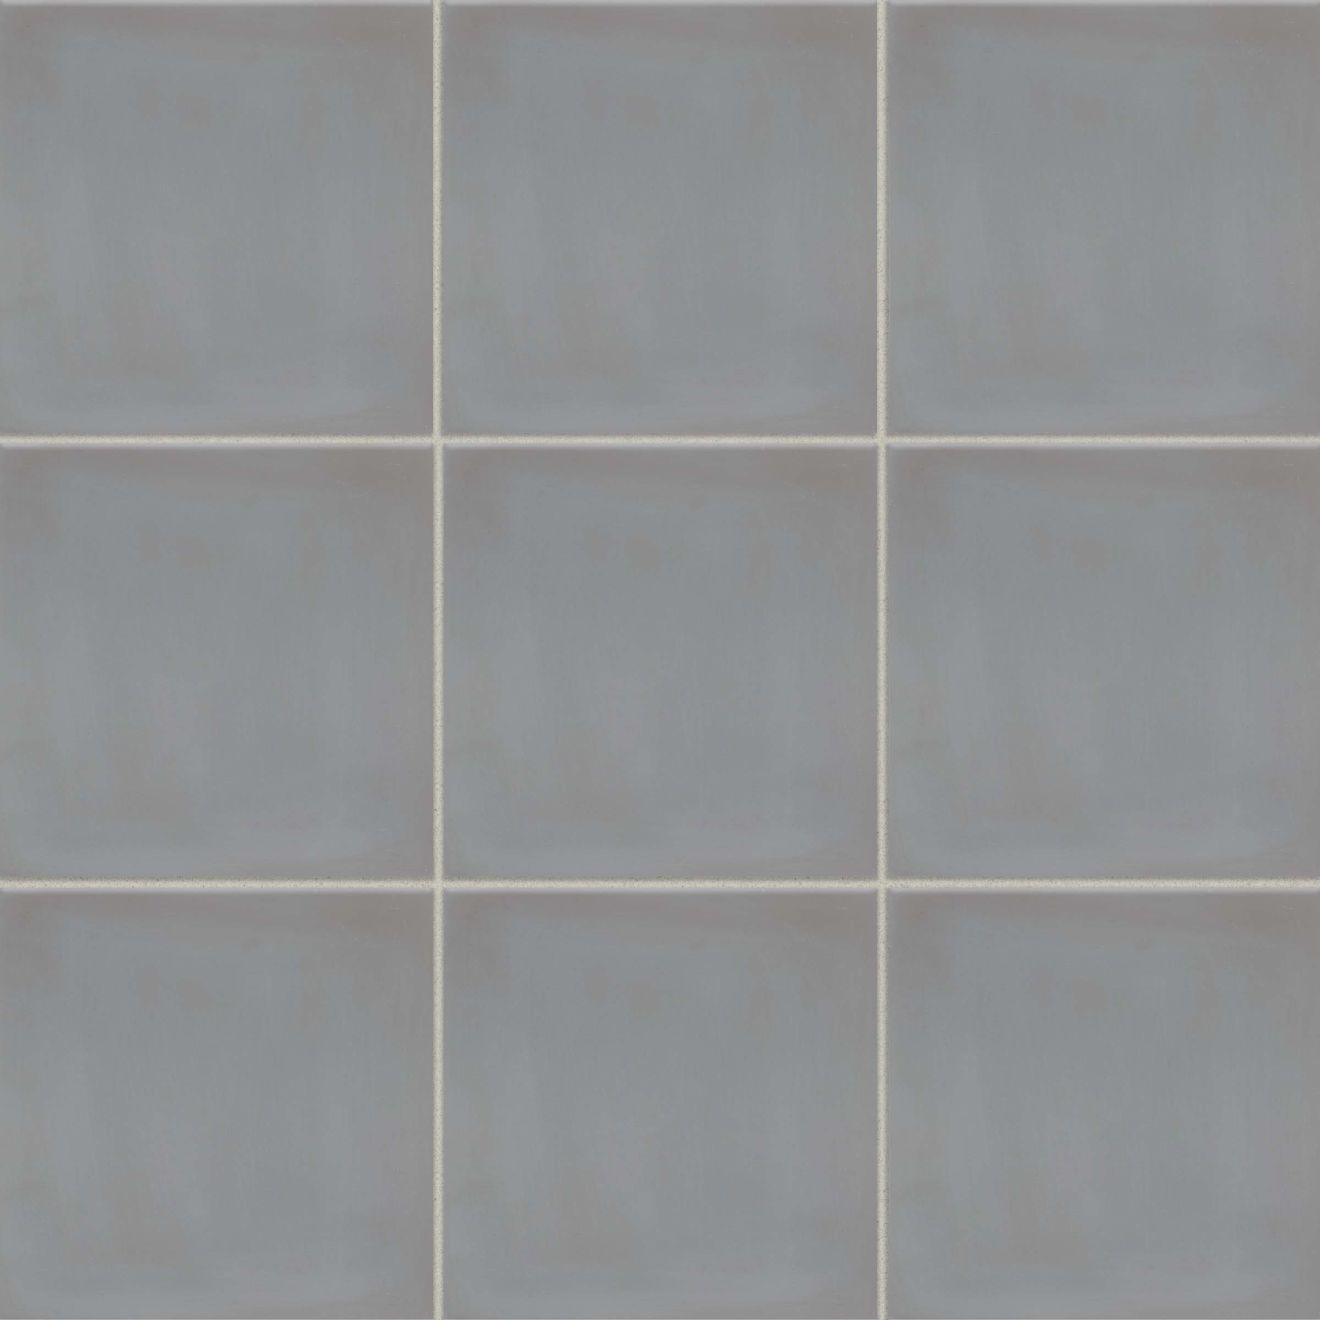 "Remy 8"" x 8"" Floor & Wall Tile in Fog"